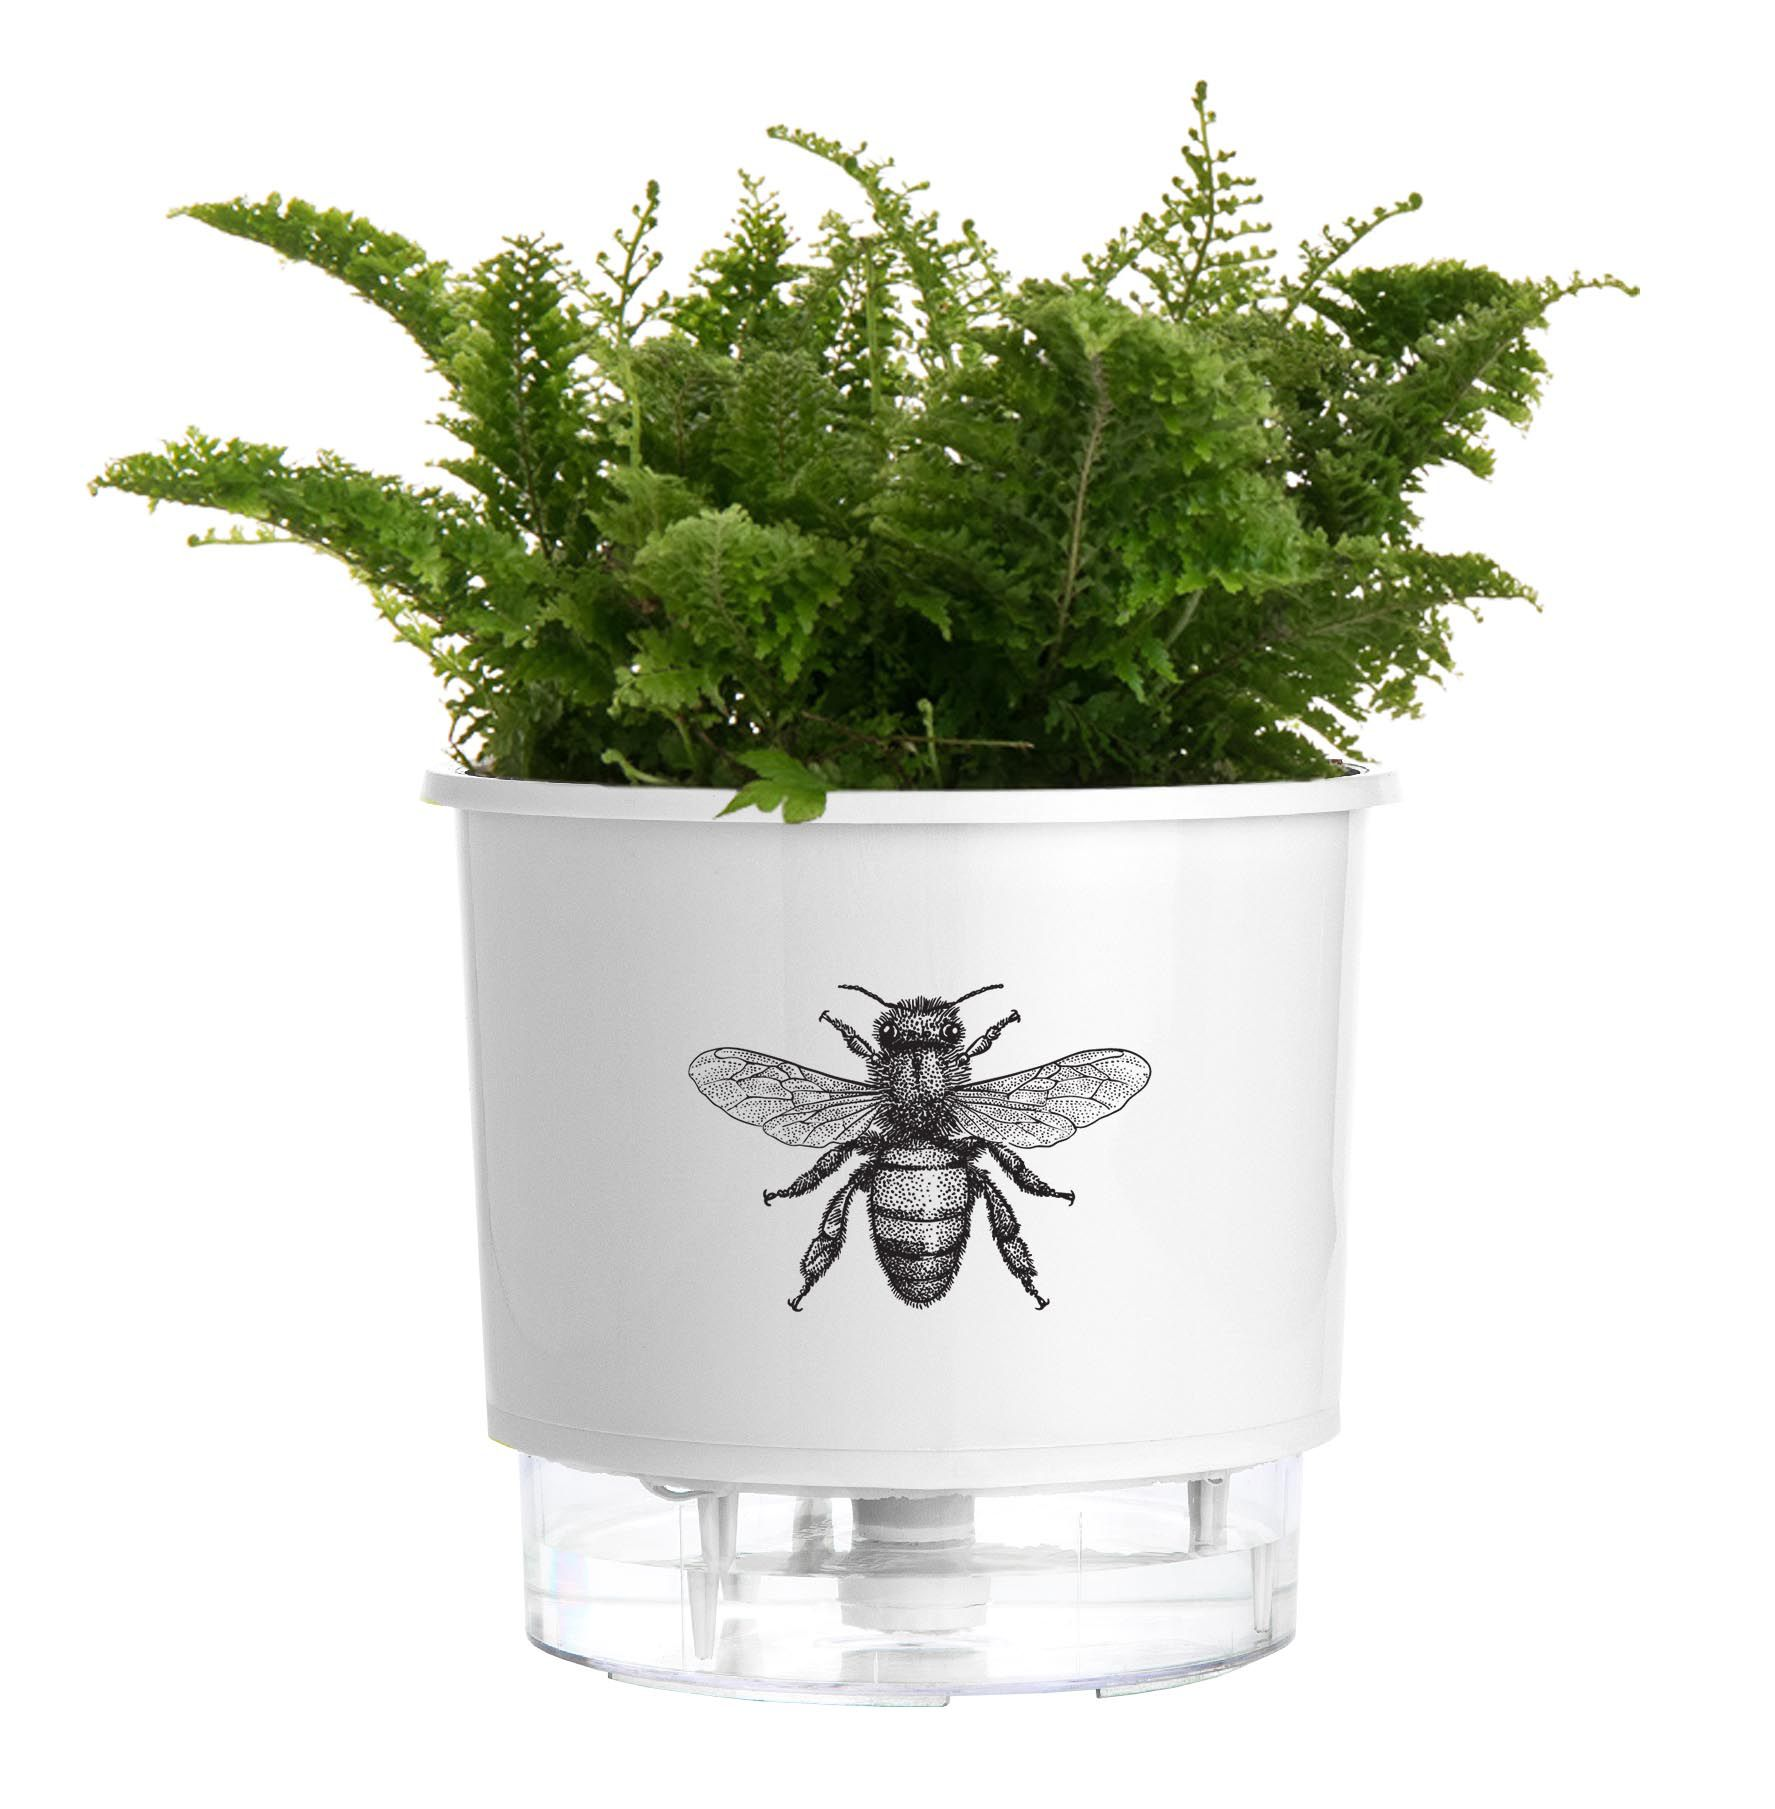 Vaso Autoirrigável Pequeno N02 12cm x 11cm Branco Abelha  - Vasos Raiz Loja Oficial